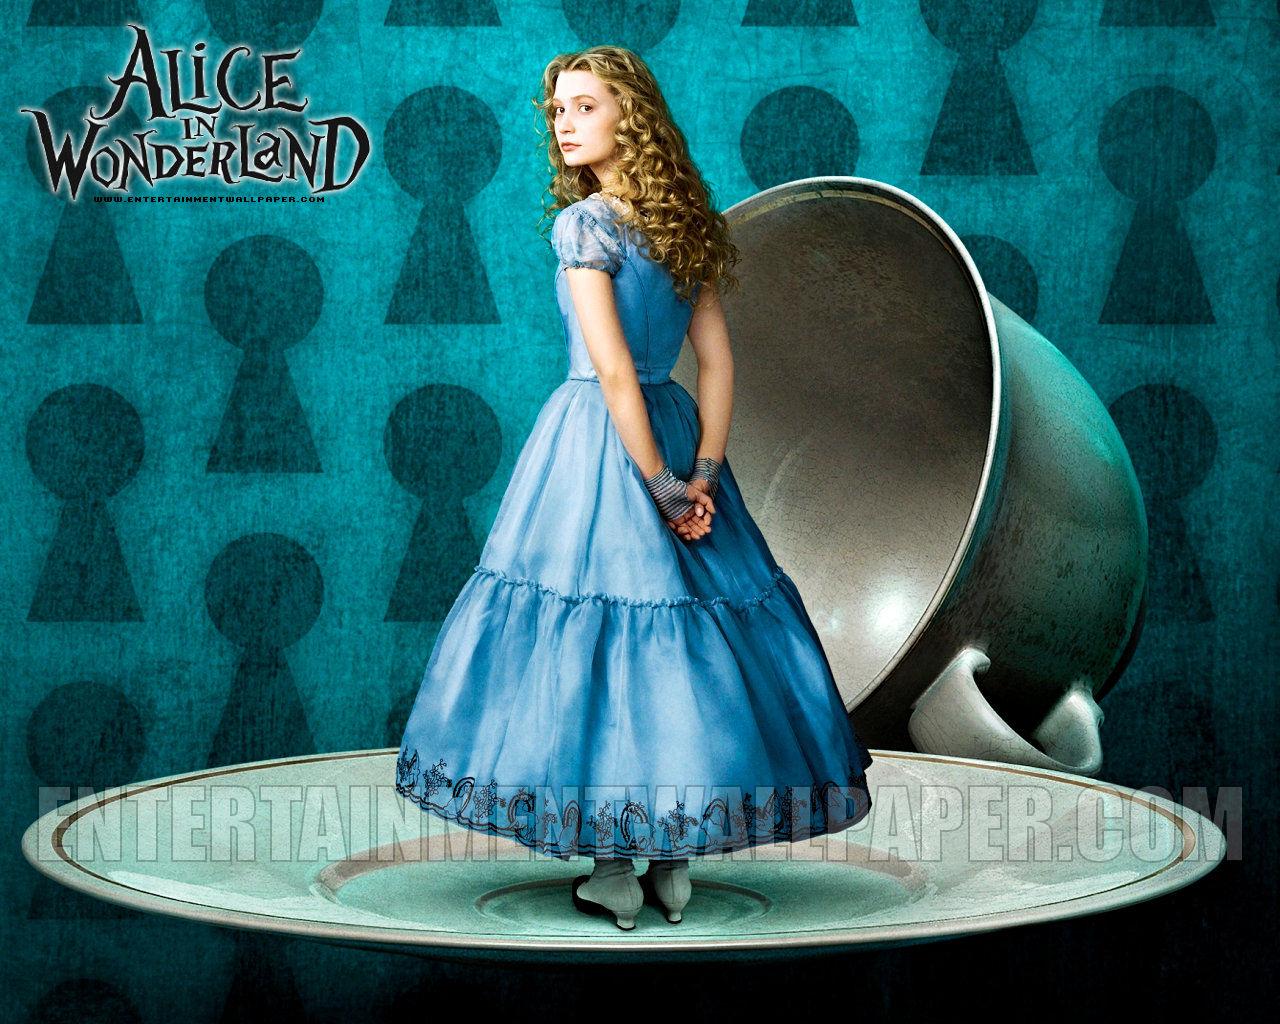 http://3.bp.blogspot.com/_ZyCRXzIGAHw/TAzeXCx48II/AAAAAAAAAZo/sgH03dbQjDI/s1600/Alice+in+Wonderland++wallpaper.jpg